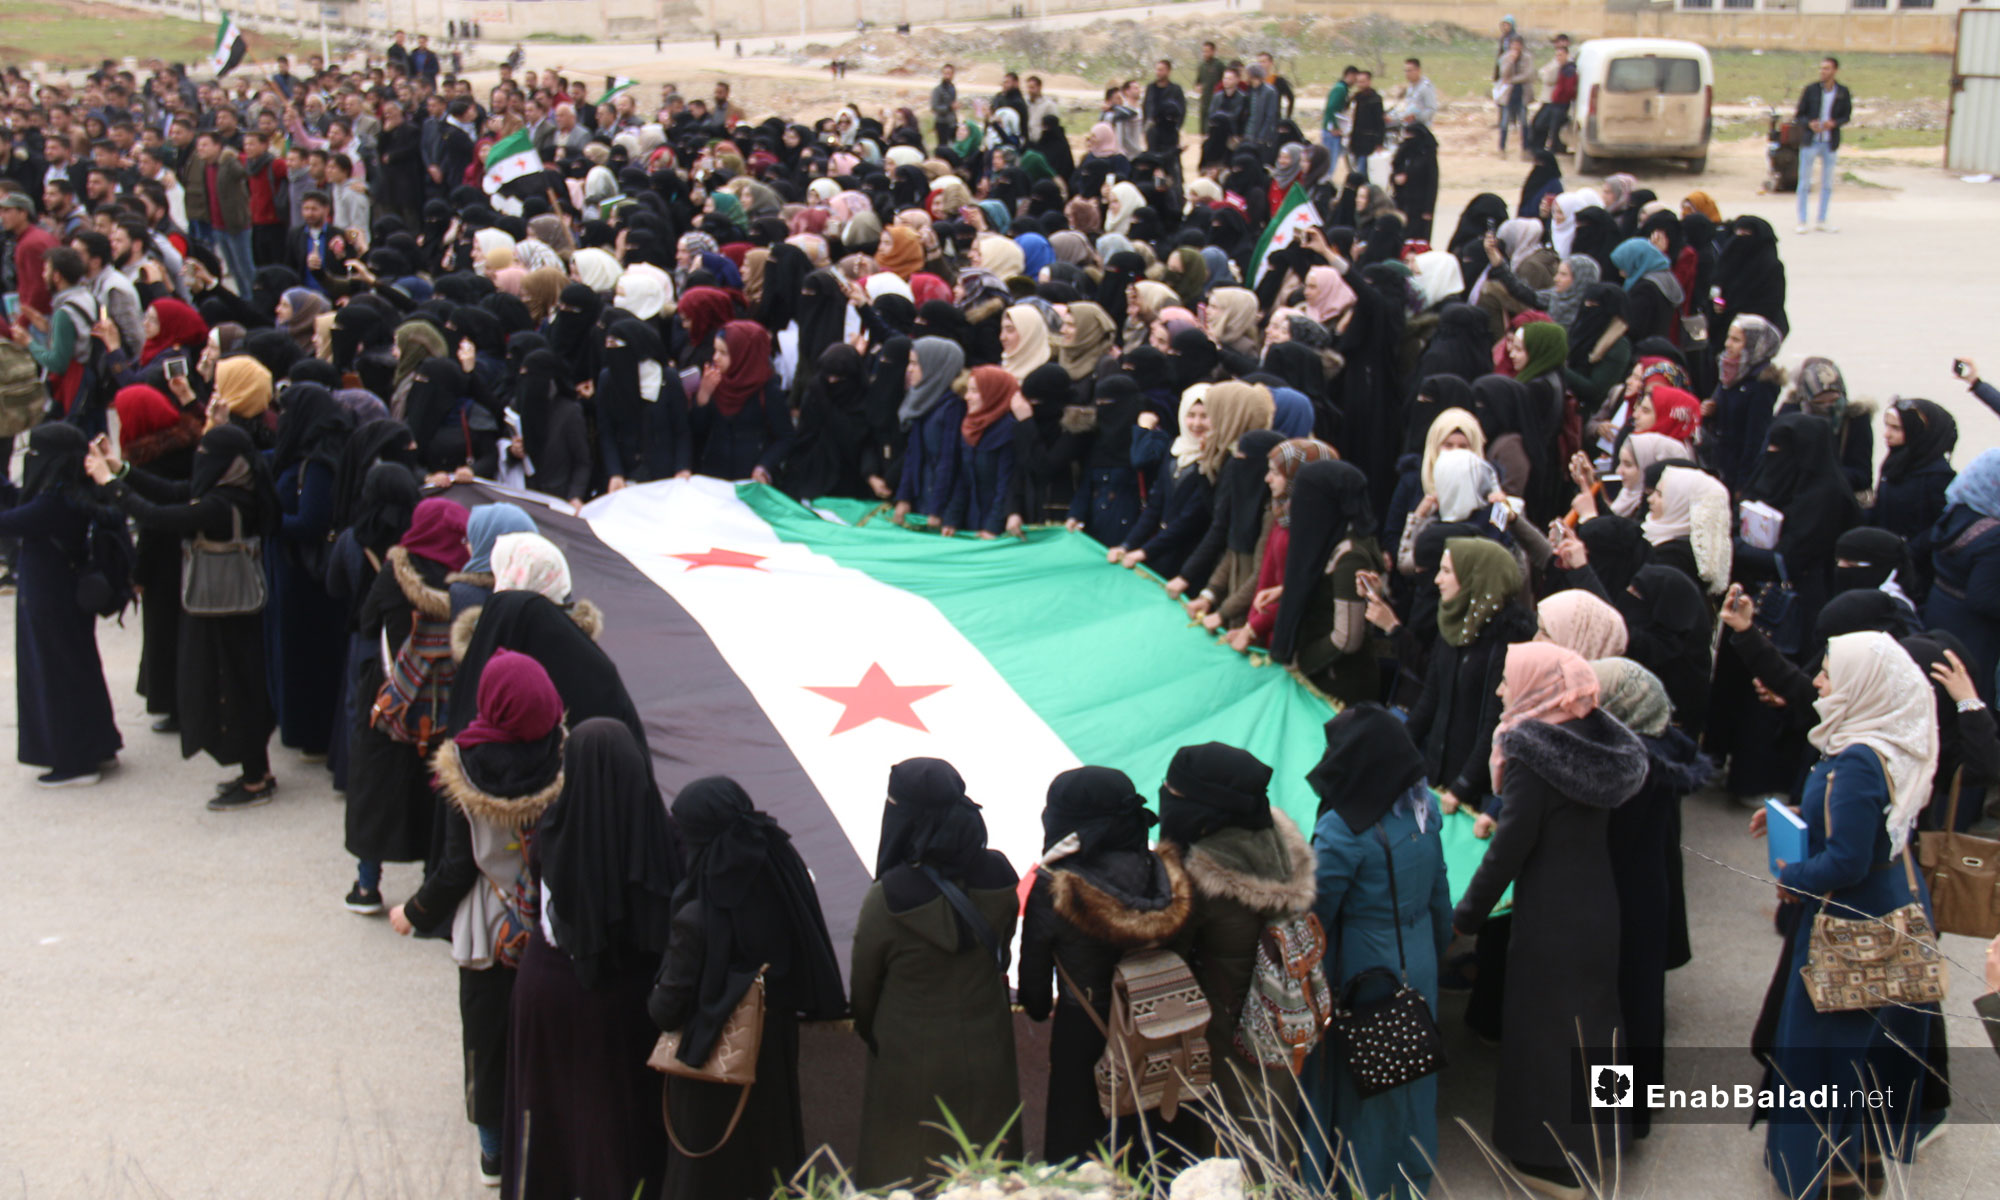 A demonstration by Idlib University students on the Syrian revolution's eighth anniversary – March 18, 2019 (Enab Baladi)